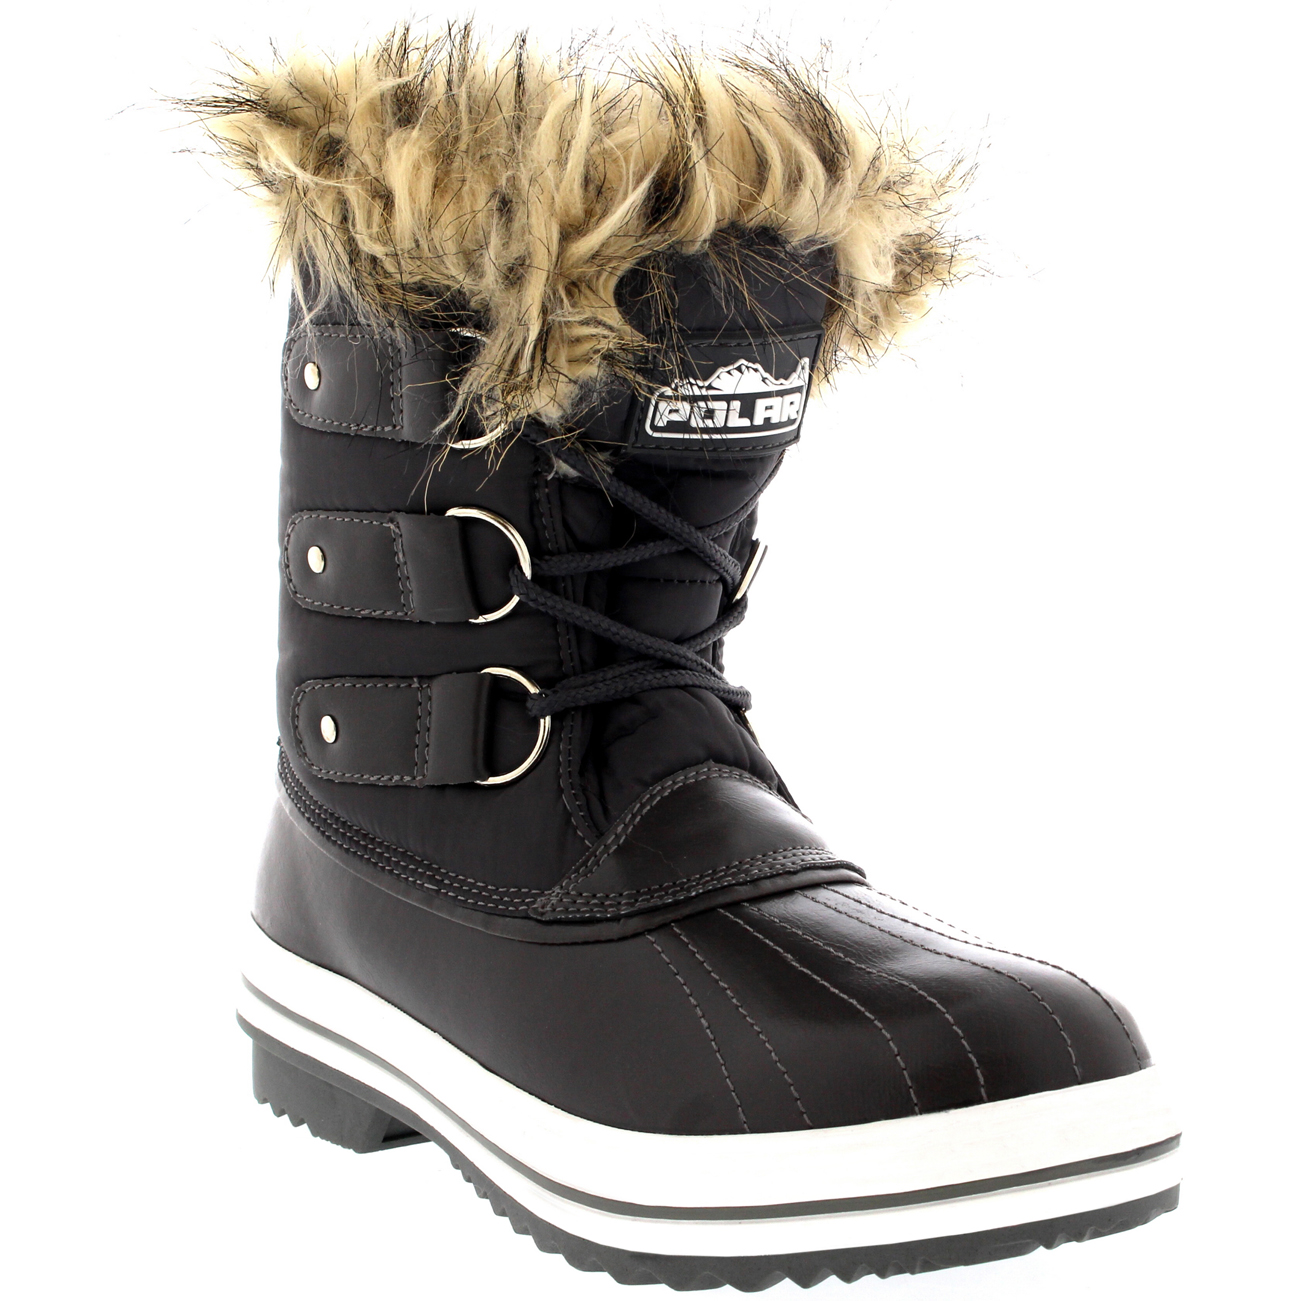 Women's Rubber Snow Boots | Homewood Mountain Ski Resort